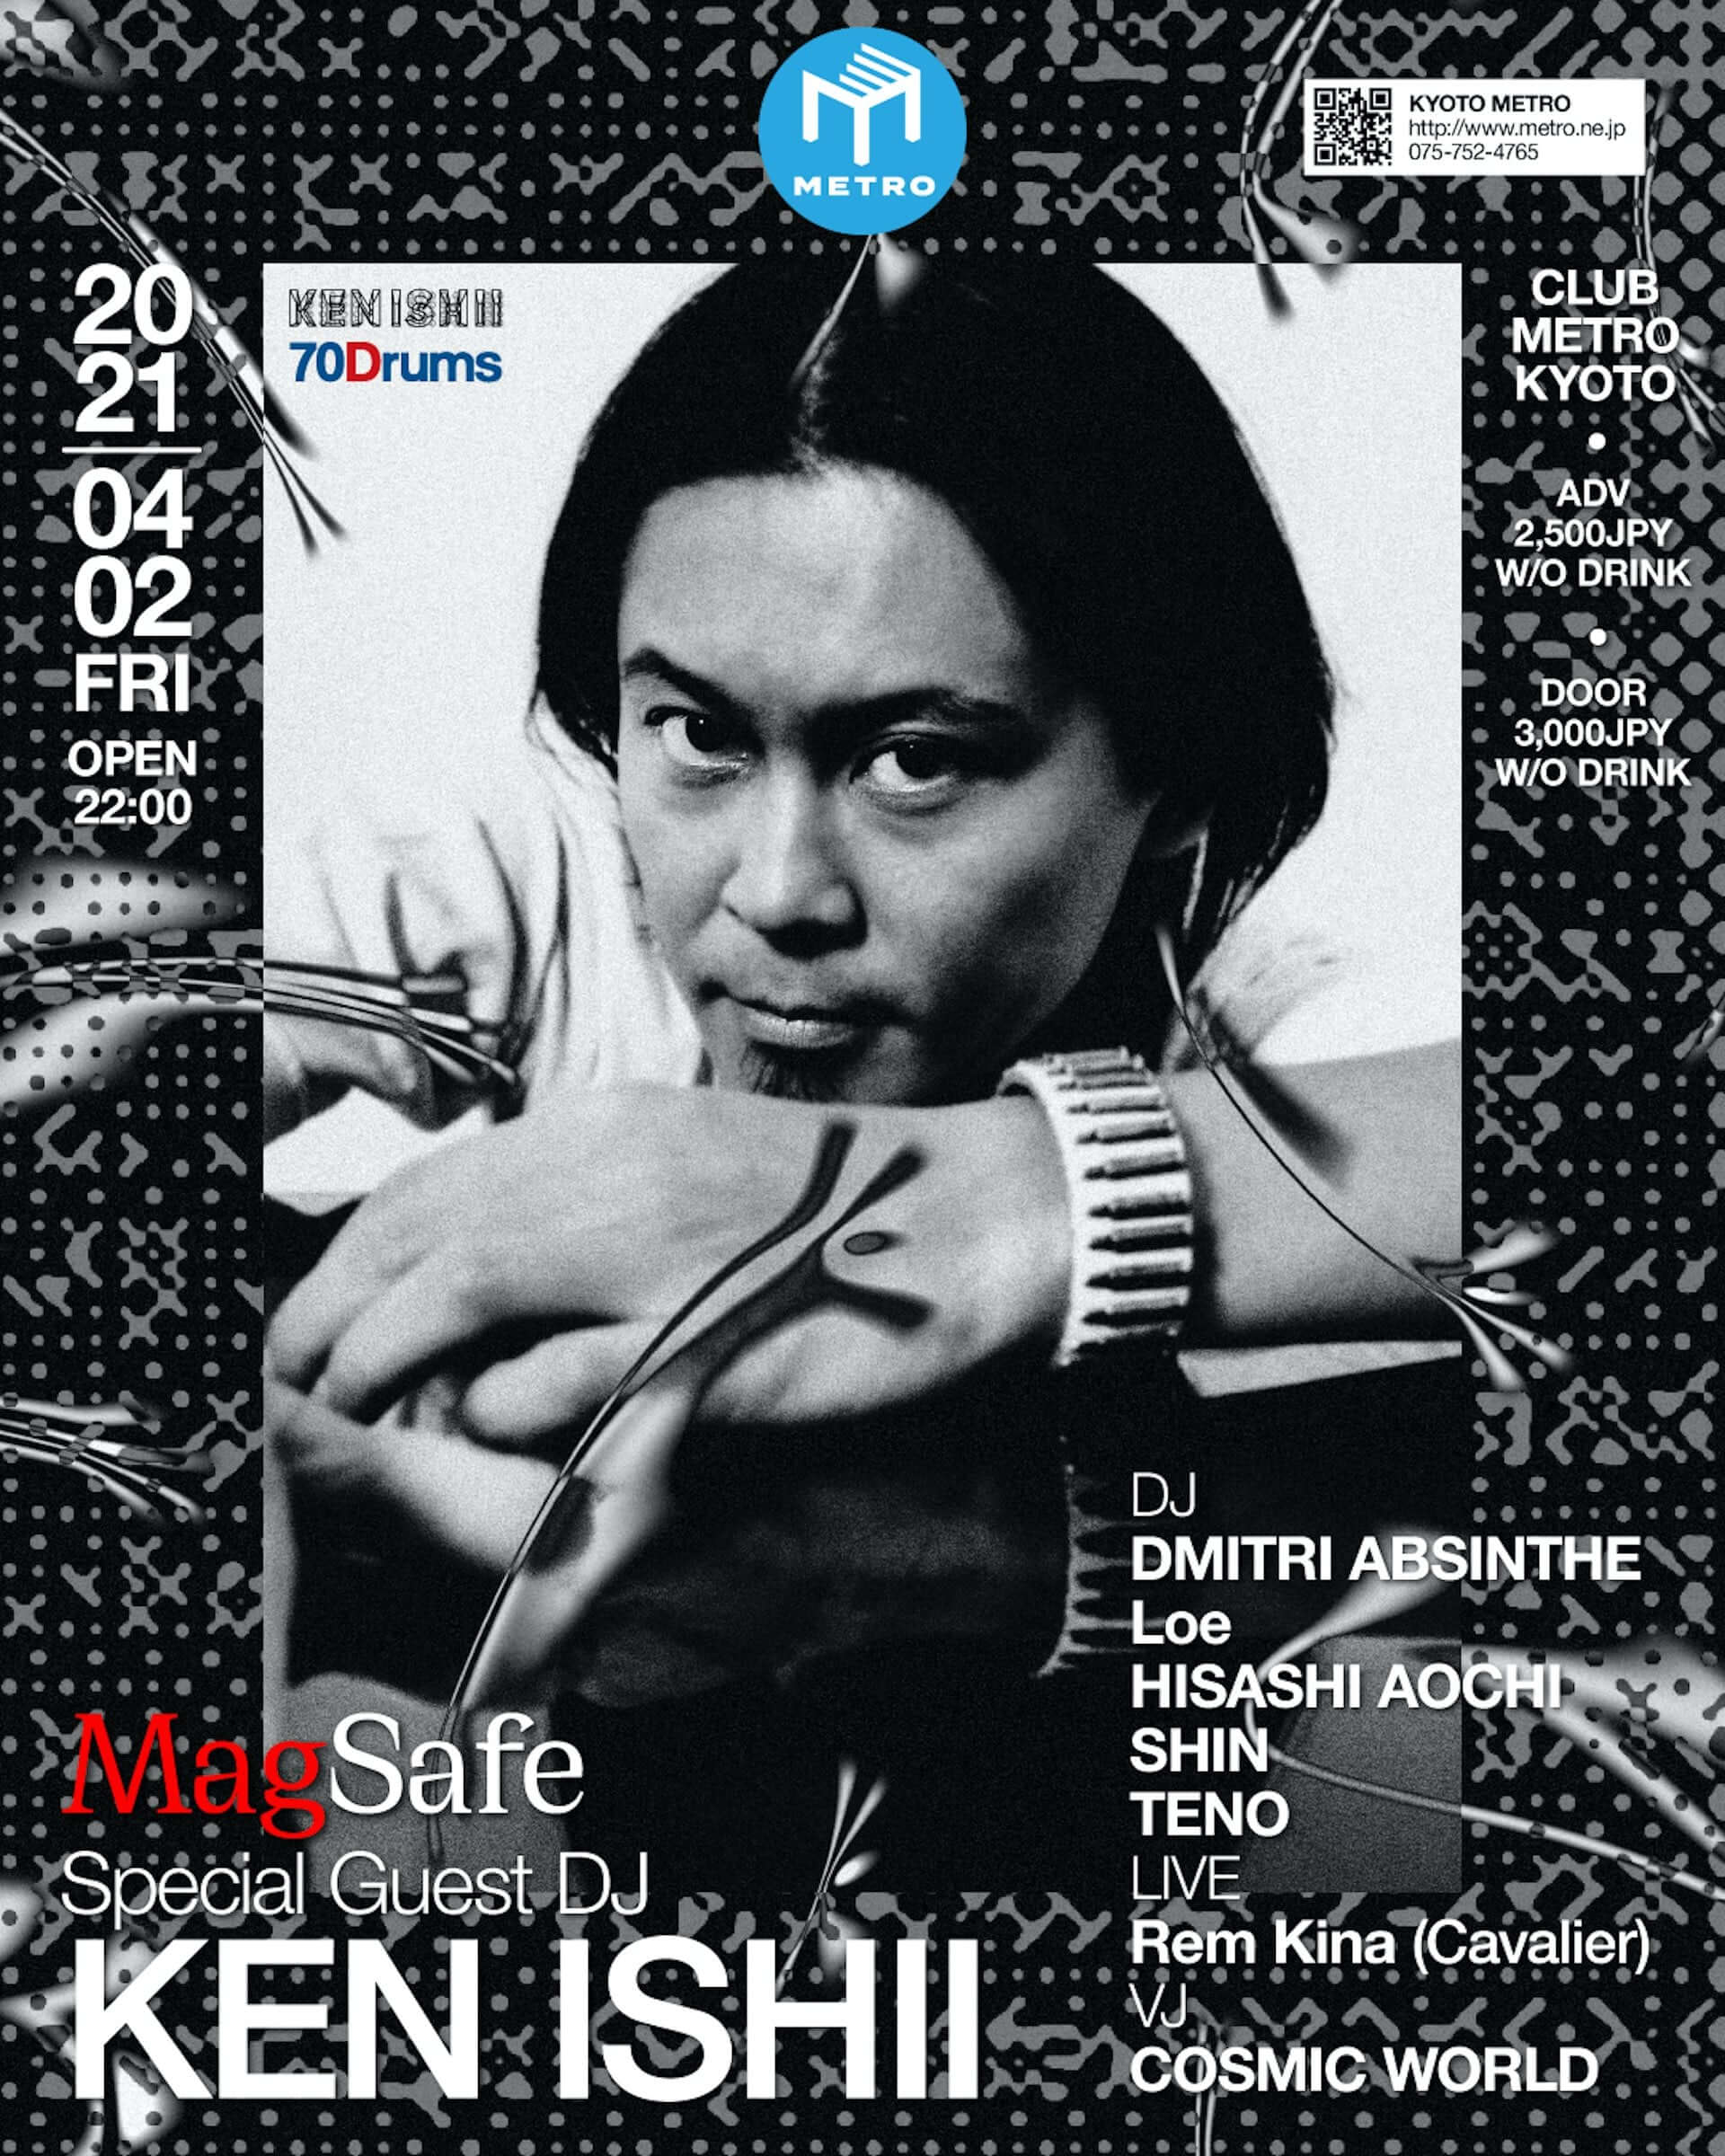 KEN ISHIIを迎えた新パーティー<MagSafe>が京都METROで開催決定!Rem Kina、HISASHI AOCHI、DMITRI ABSINTHEらも出演 music210312_magsafe_2-1920x2400